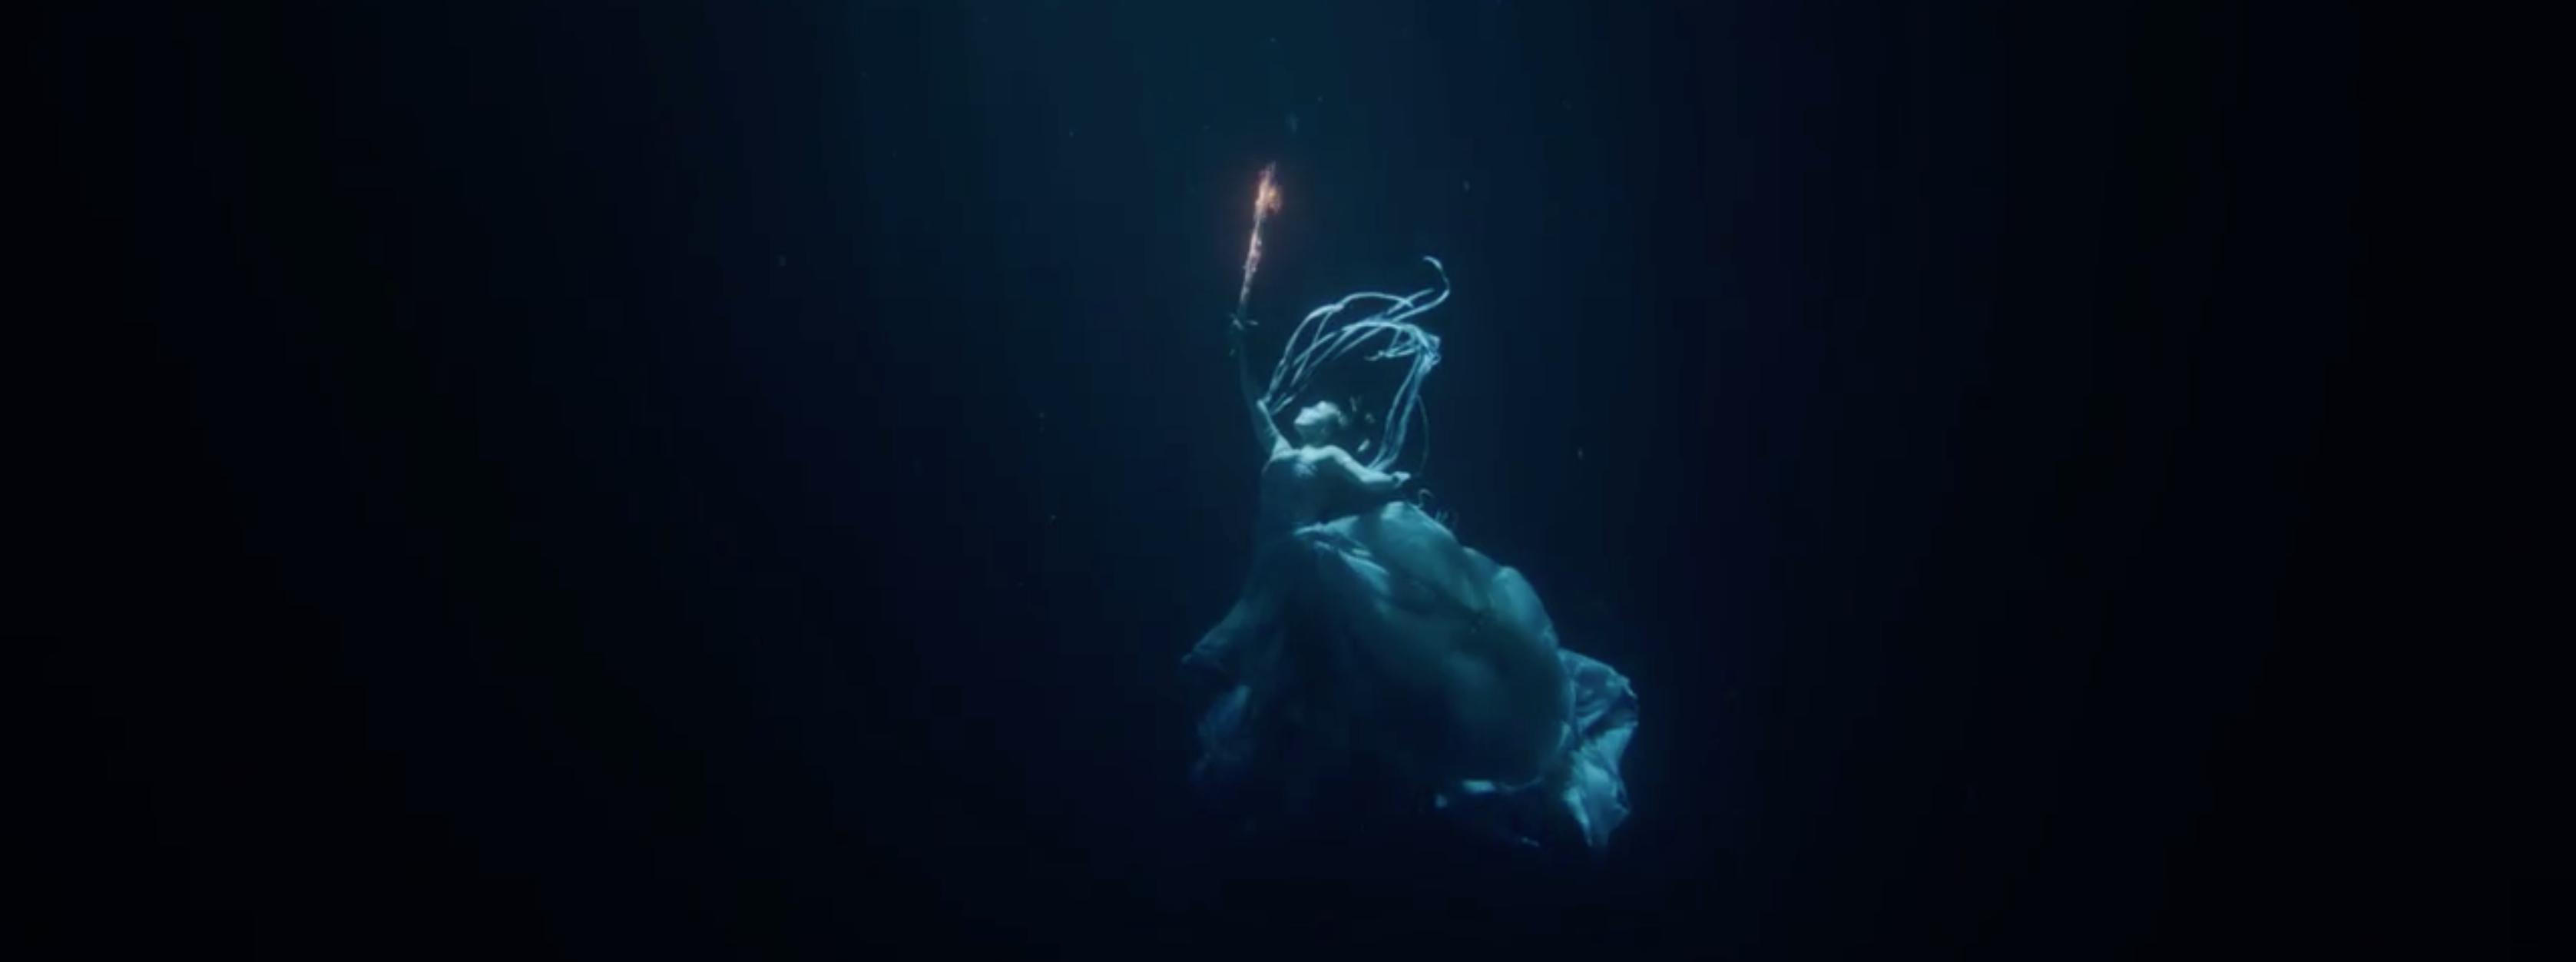 Excalibur Movie Sex Scene aidan gillen talks king arthur and game of thrones | collider